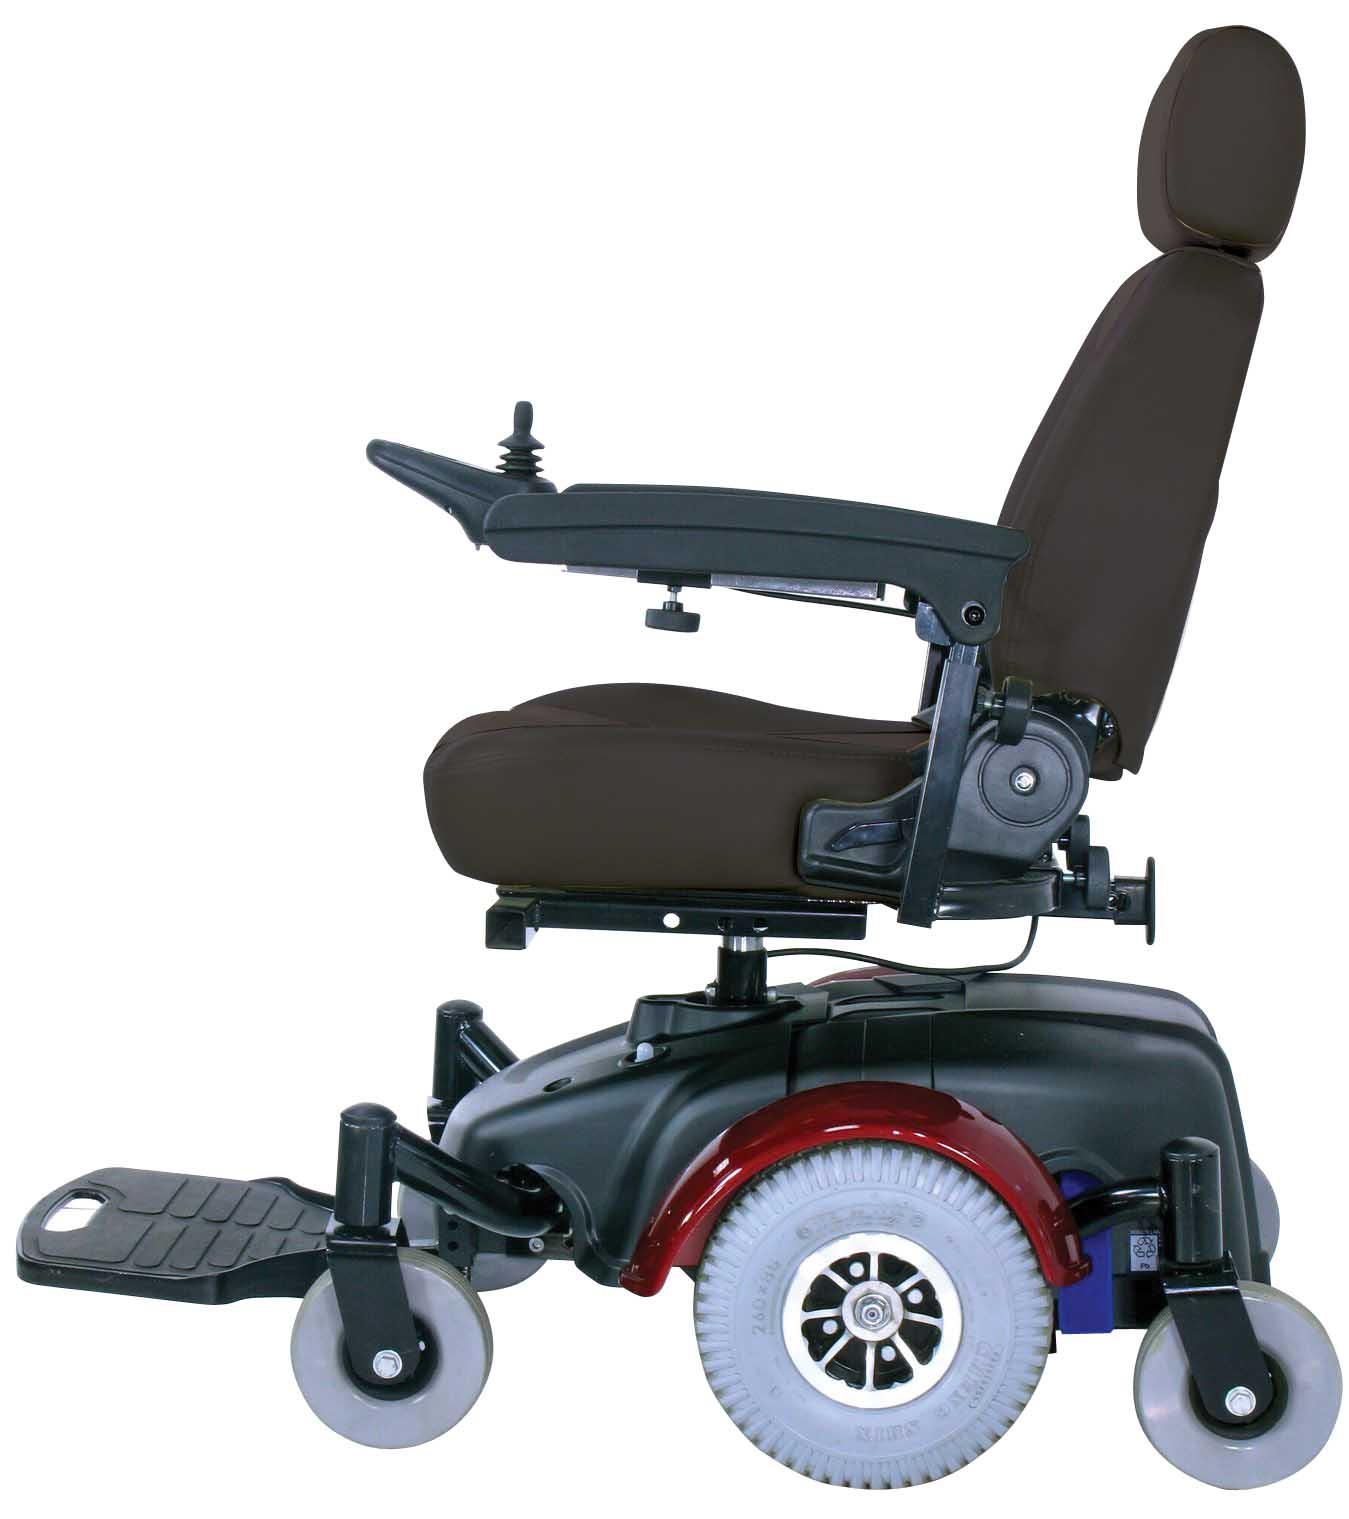 image-ec-mid-wheel-drive-power-wheelchair-2800ecbu-rcl-drive-medical-2.jpg